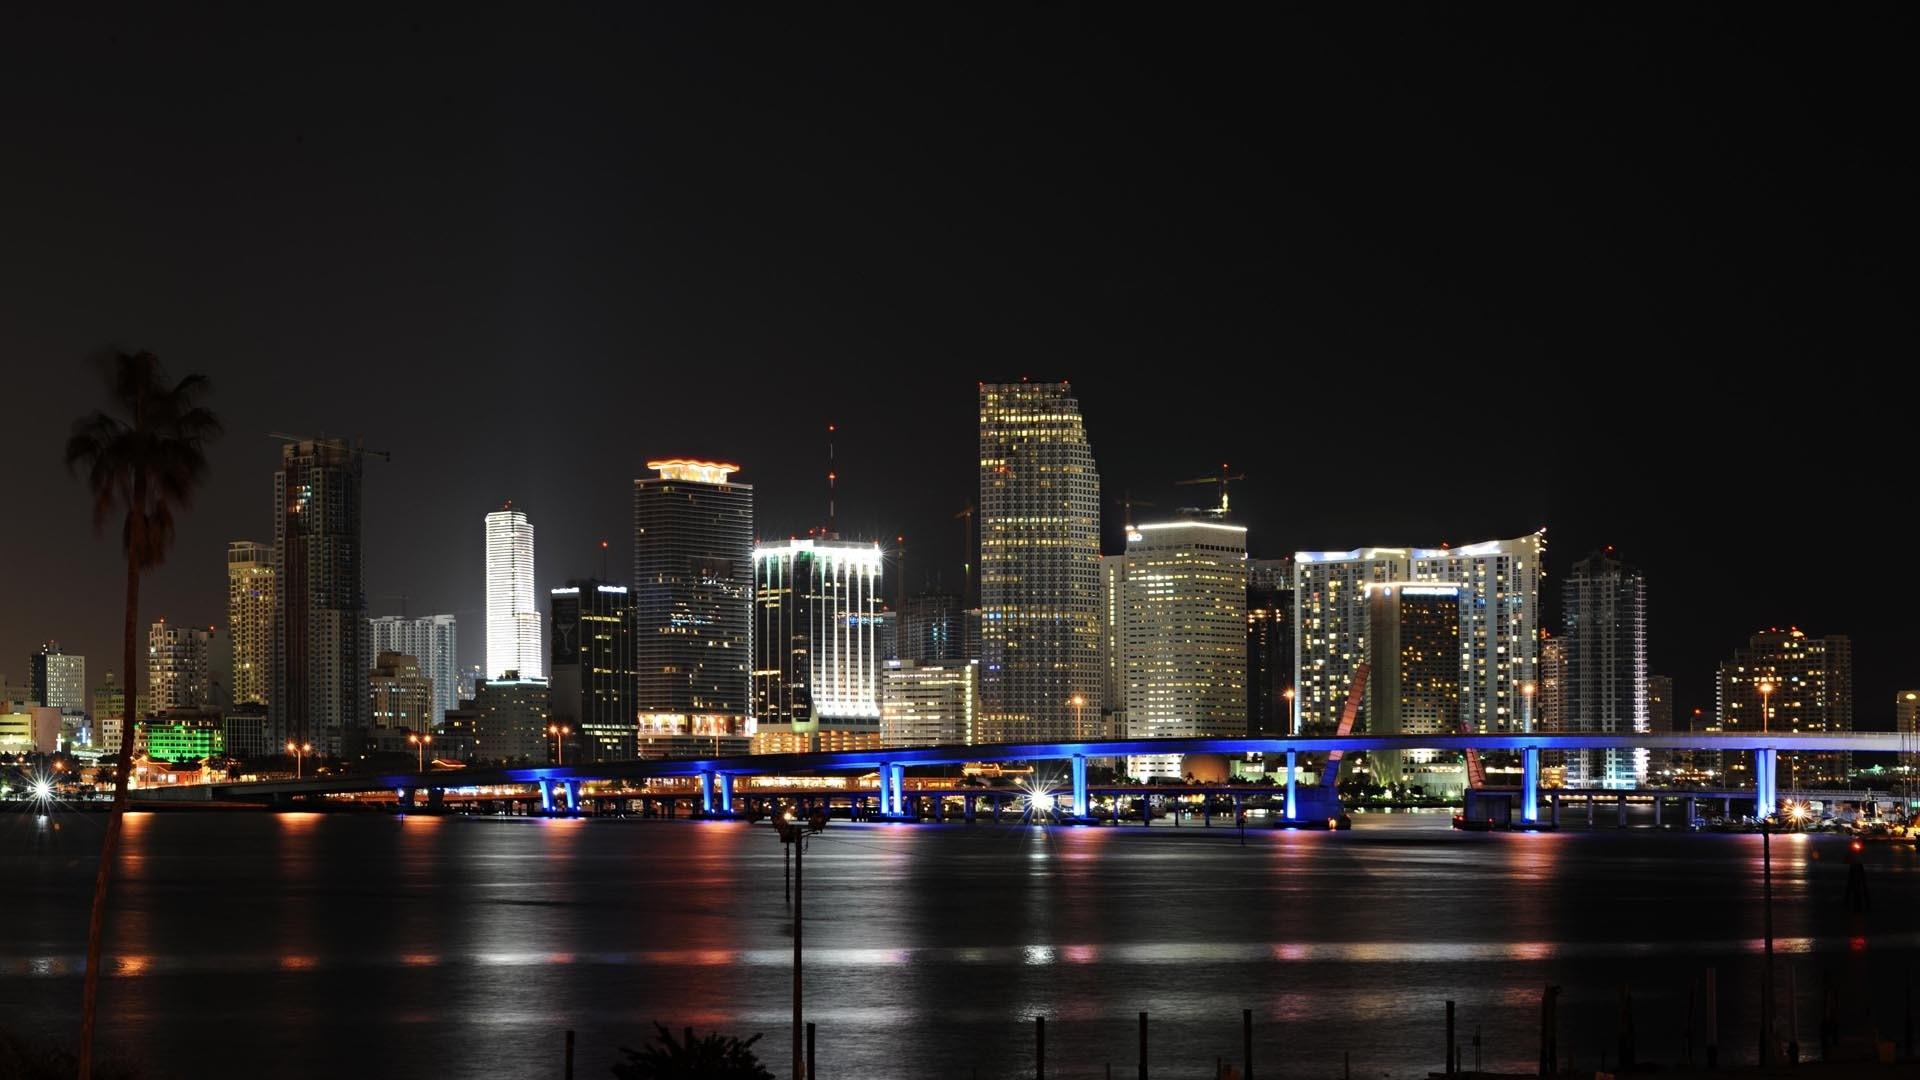 Miami, Florida HD Wallpaper 1920×1080